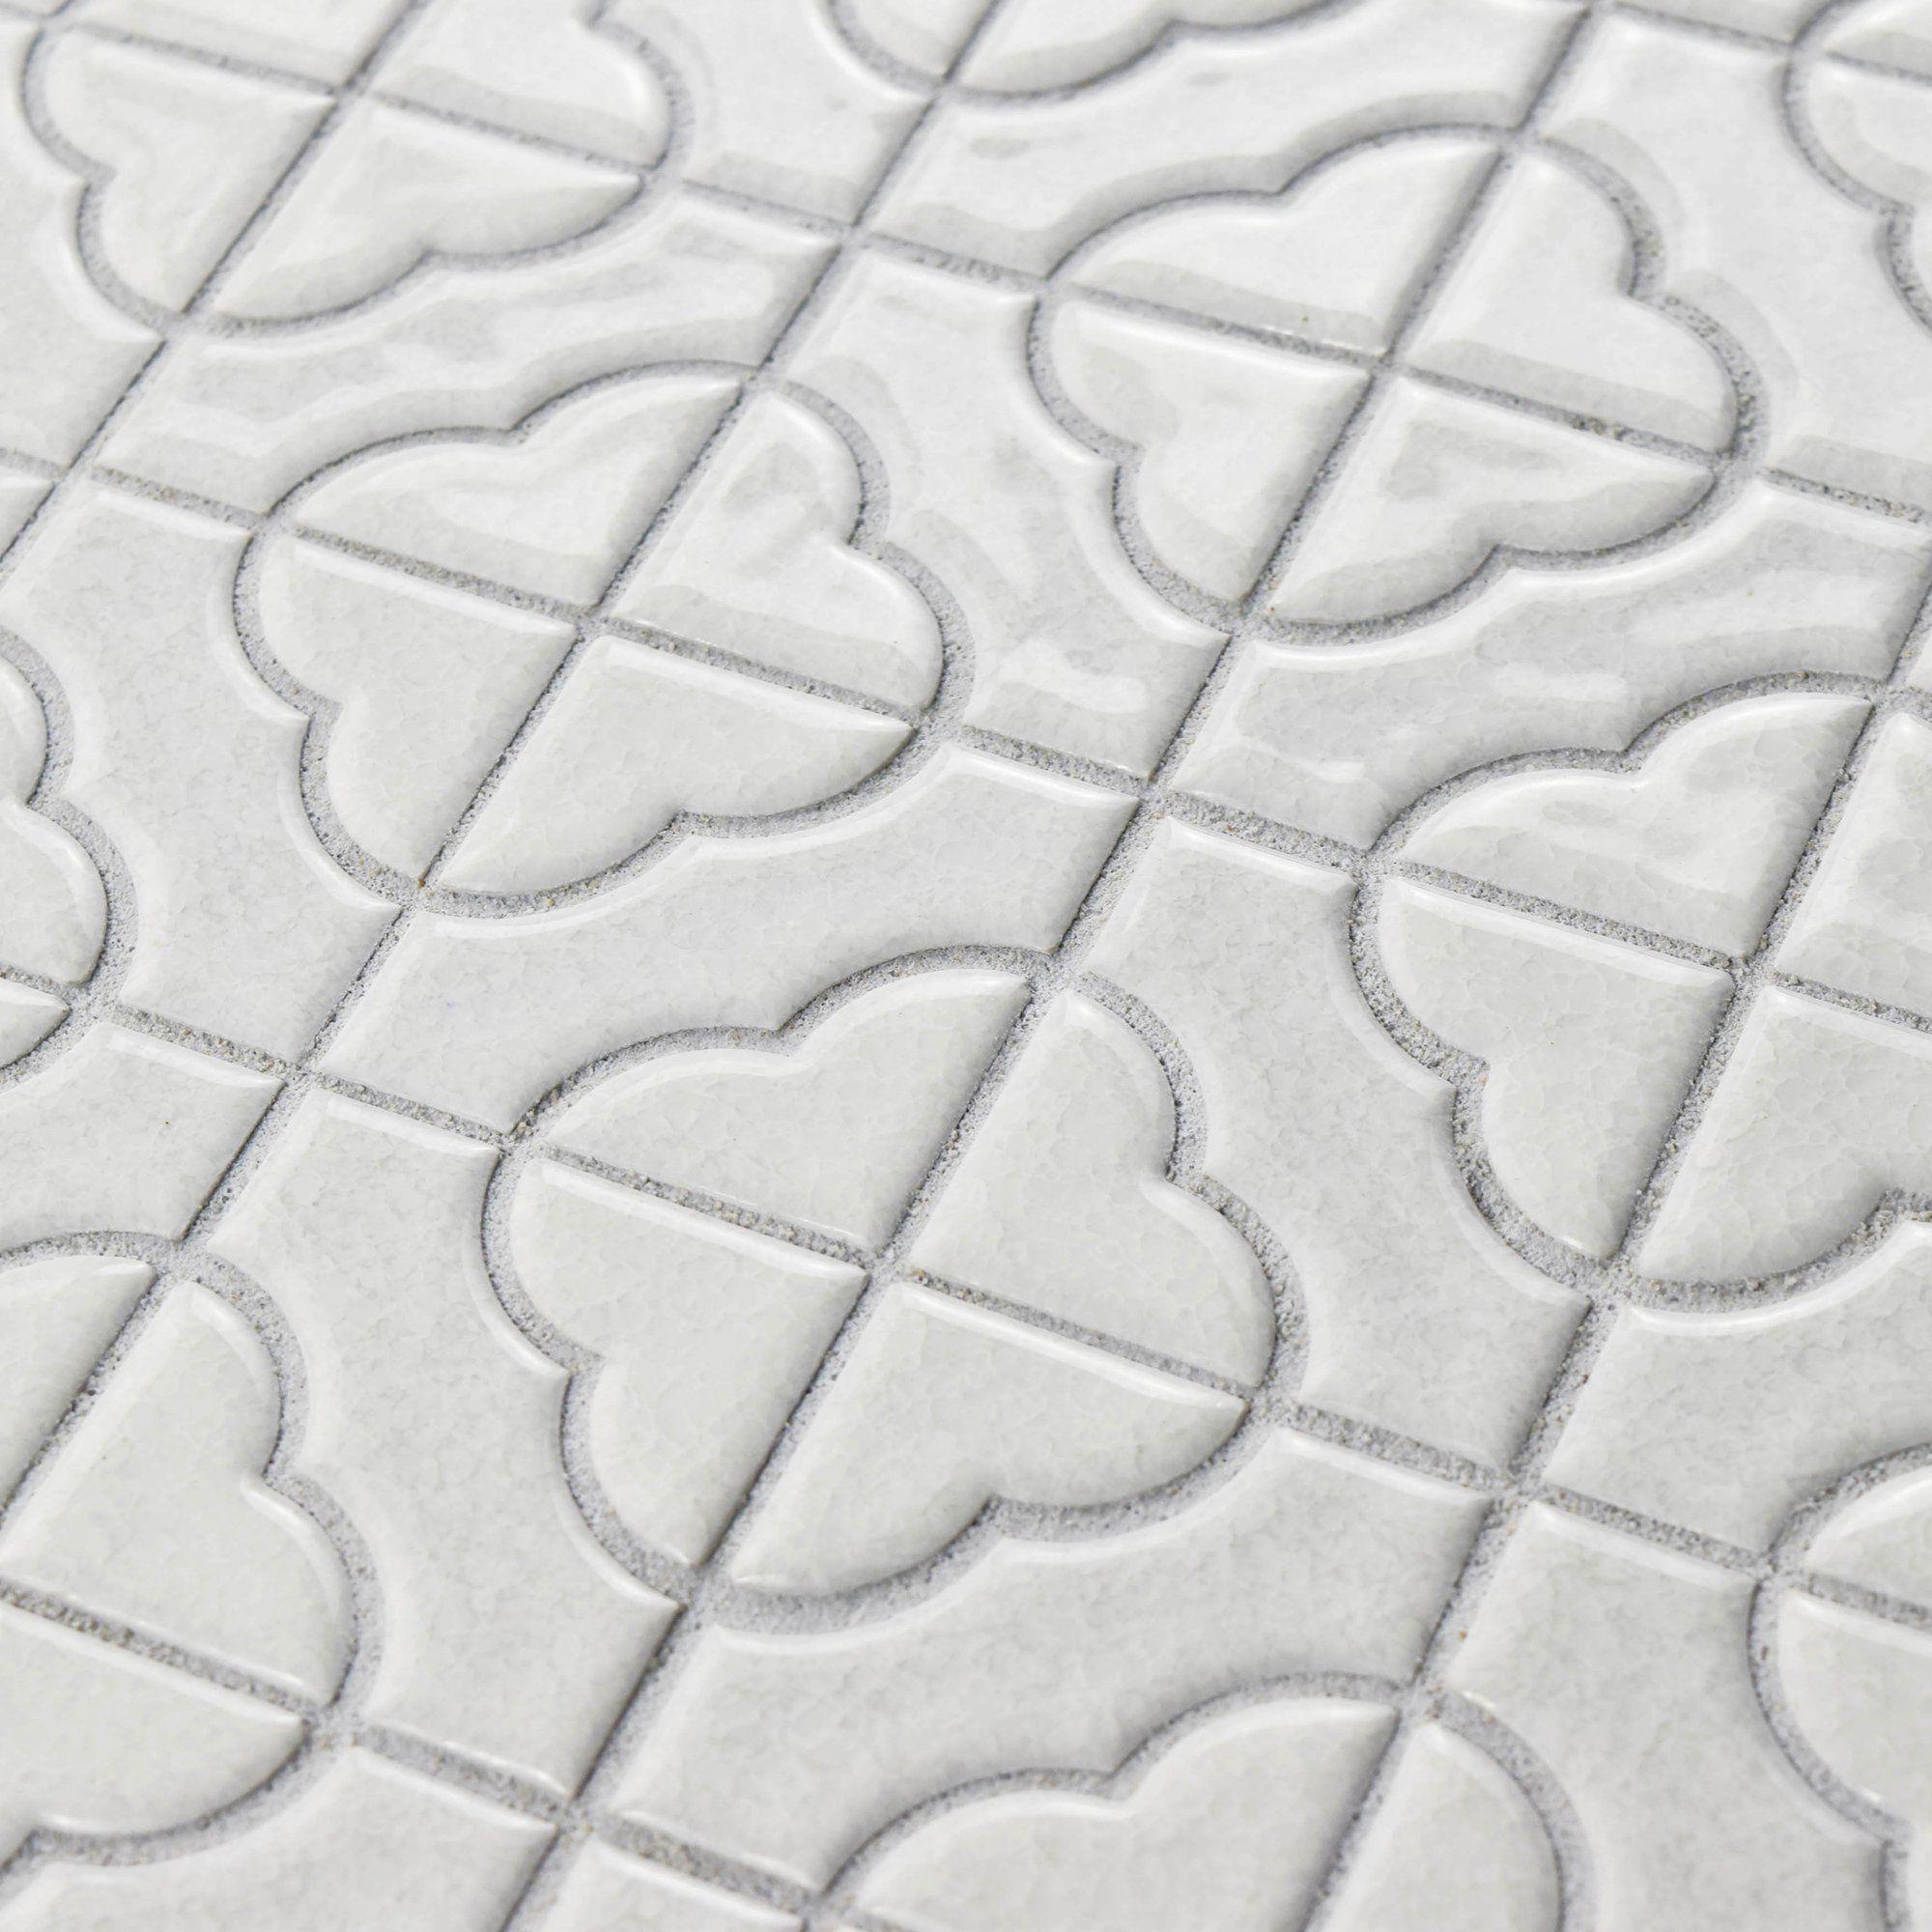 castle random sized porcelain mosaic tile in white | terb (kitchen